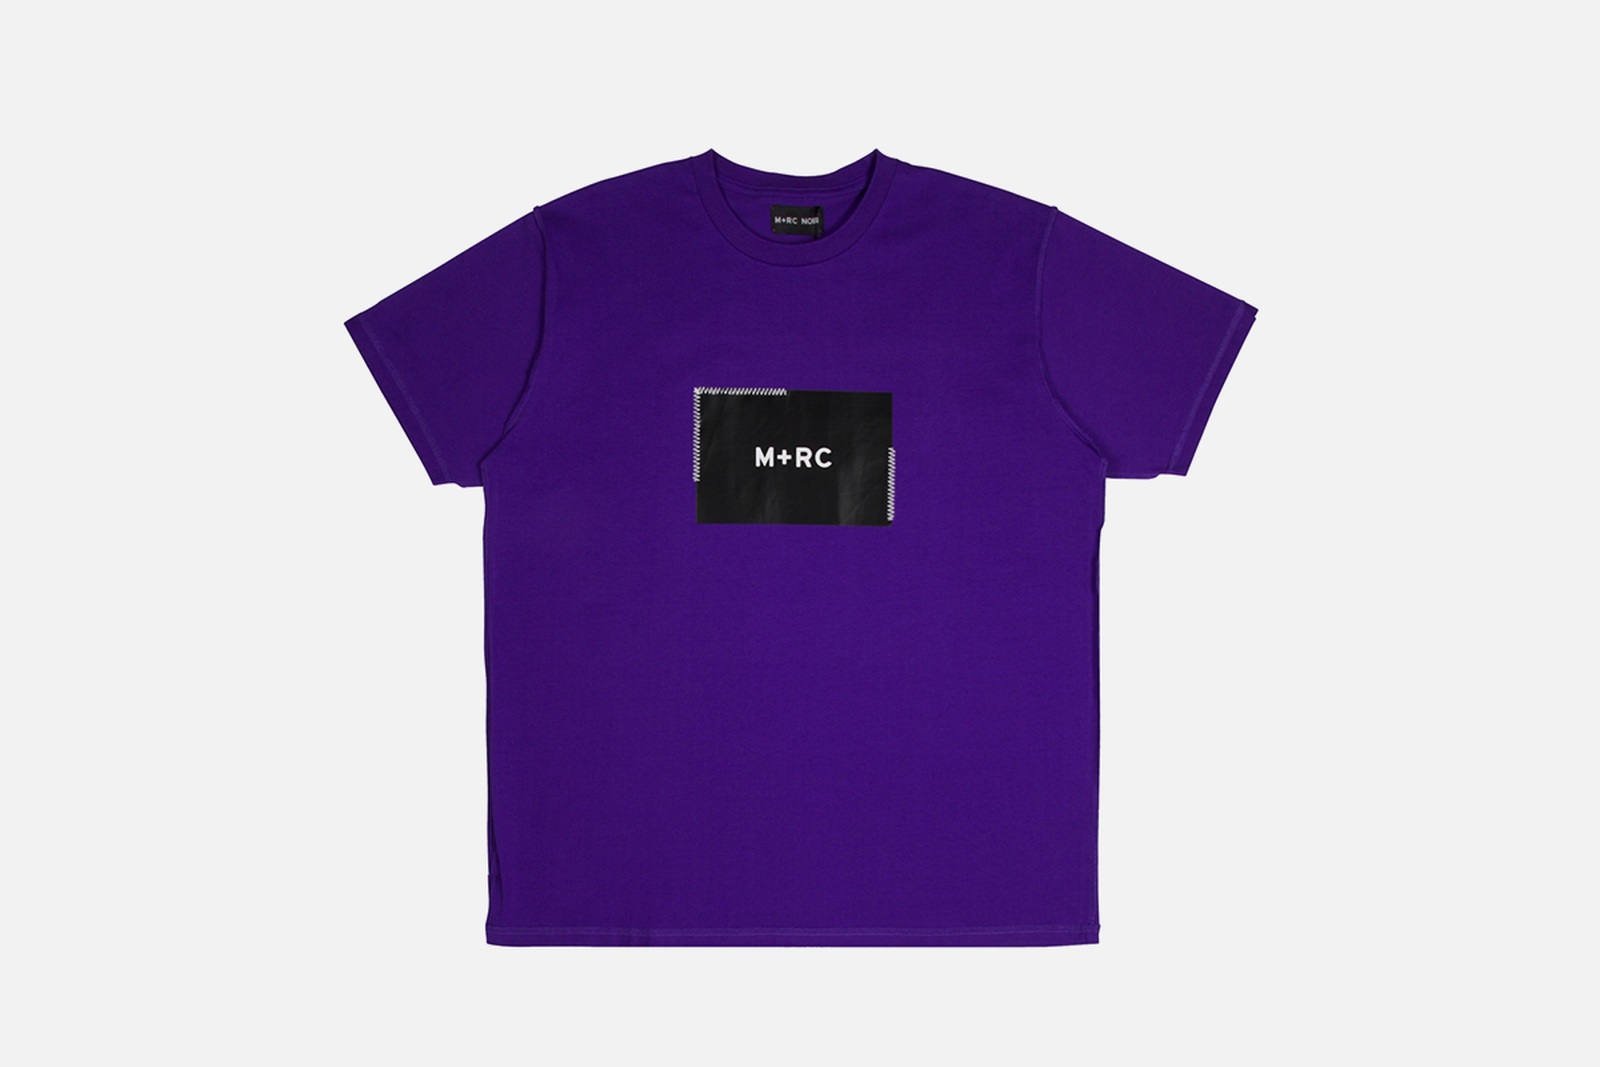 M RC NOIR box logo tee purple black front copie 1024x1024 M+RC NOIR SS18 playboi carti